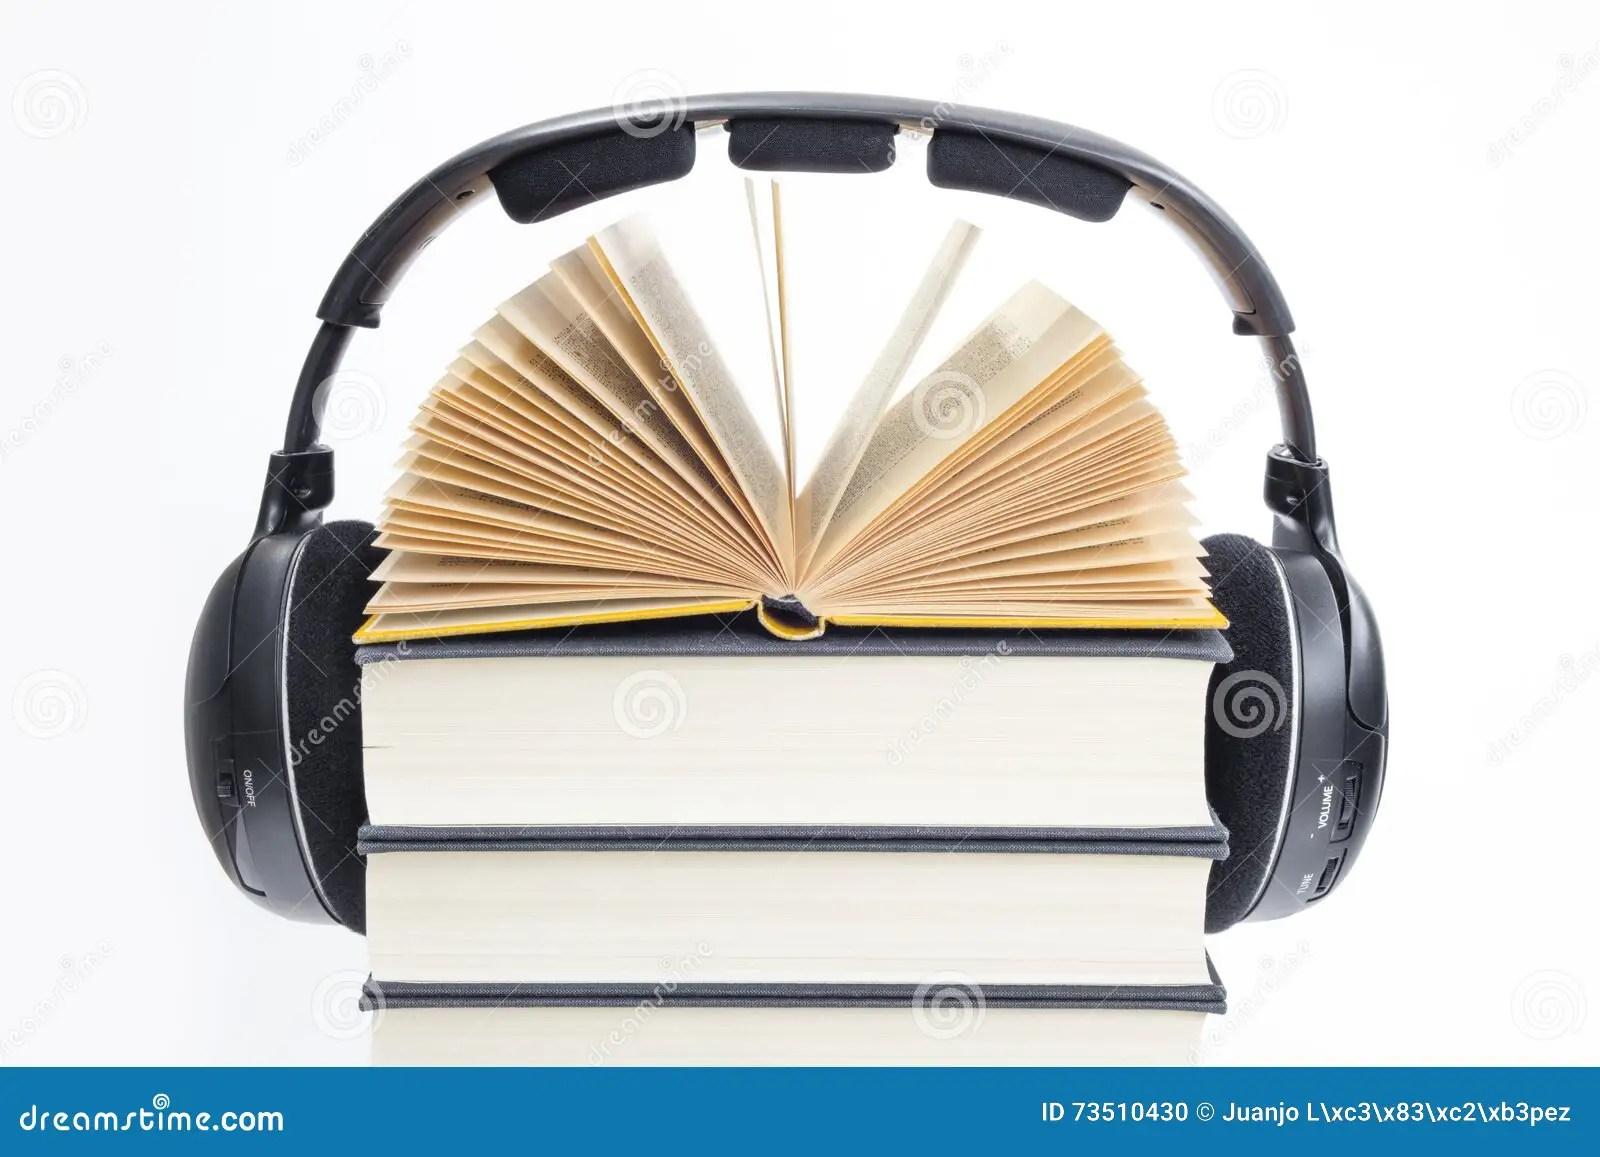 audio books second grade - 800×533